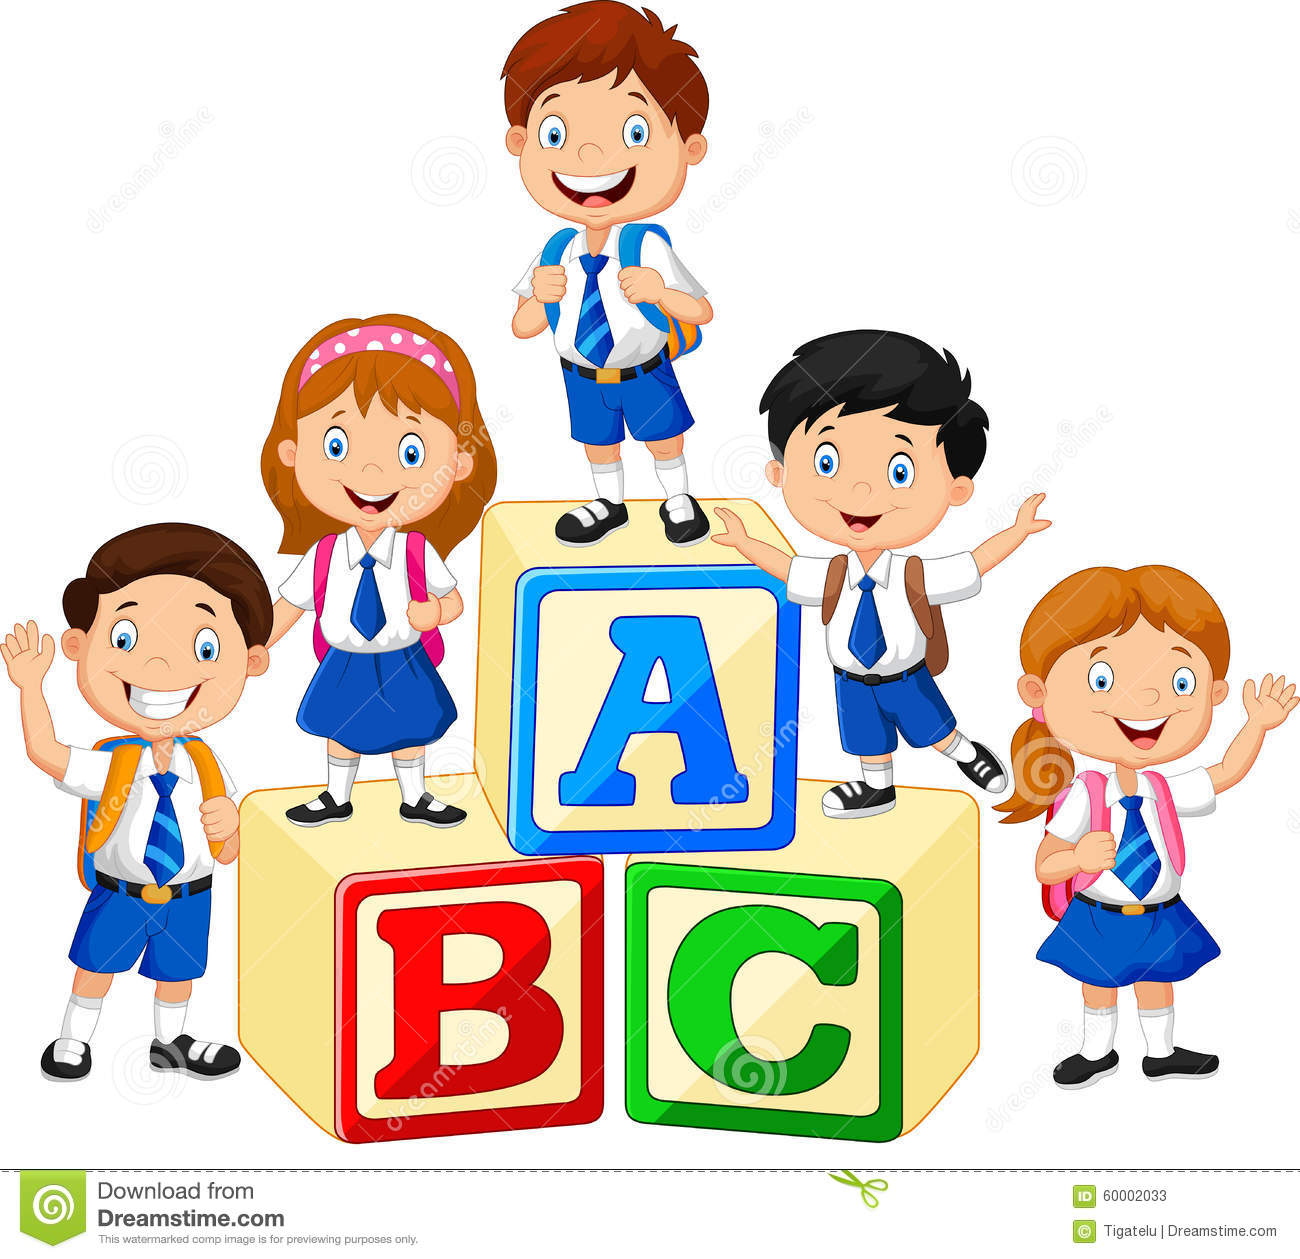 Alphabet clipart for kids jpg royalty free library School children alphabet clipart - ClipartFest jpg royalty free library